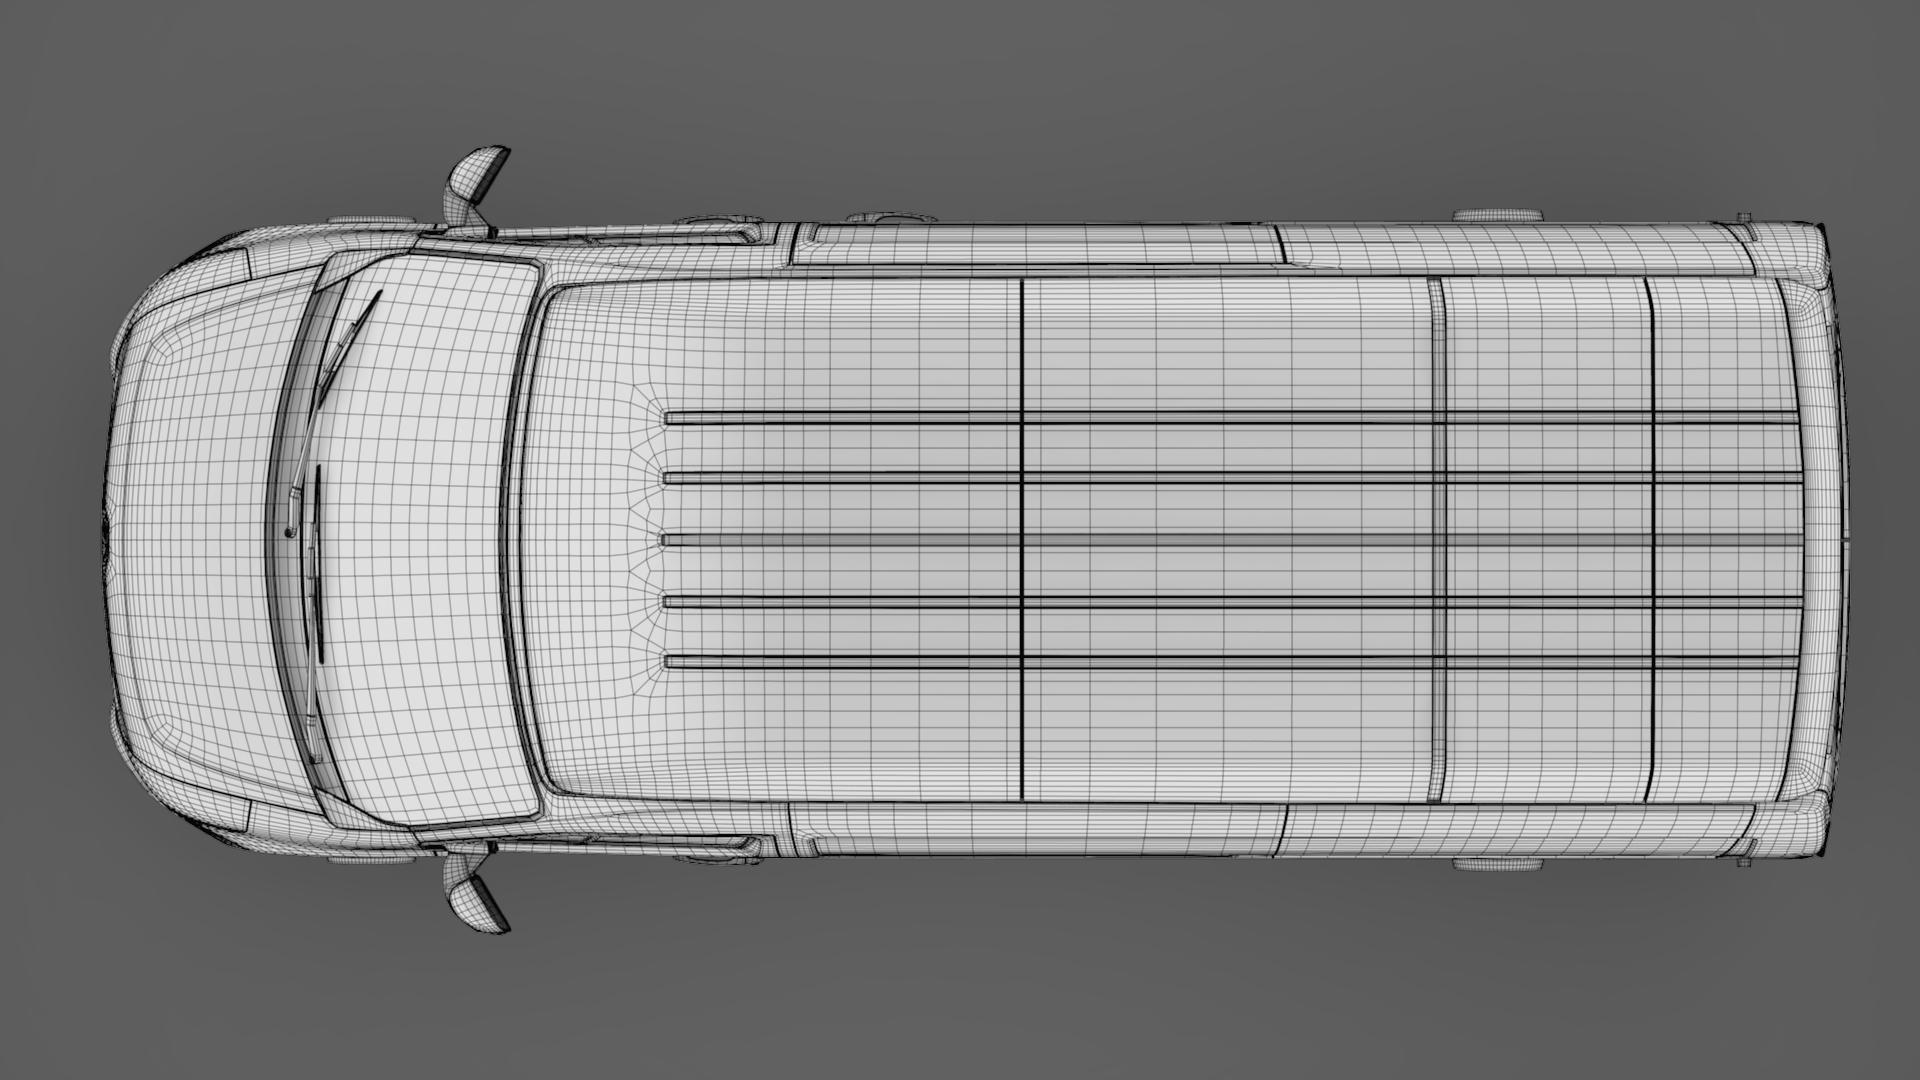 renault meistars l2h3 van 2017 3d modelis 3ds maks.